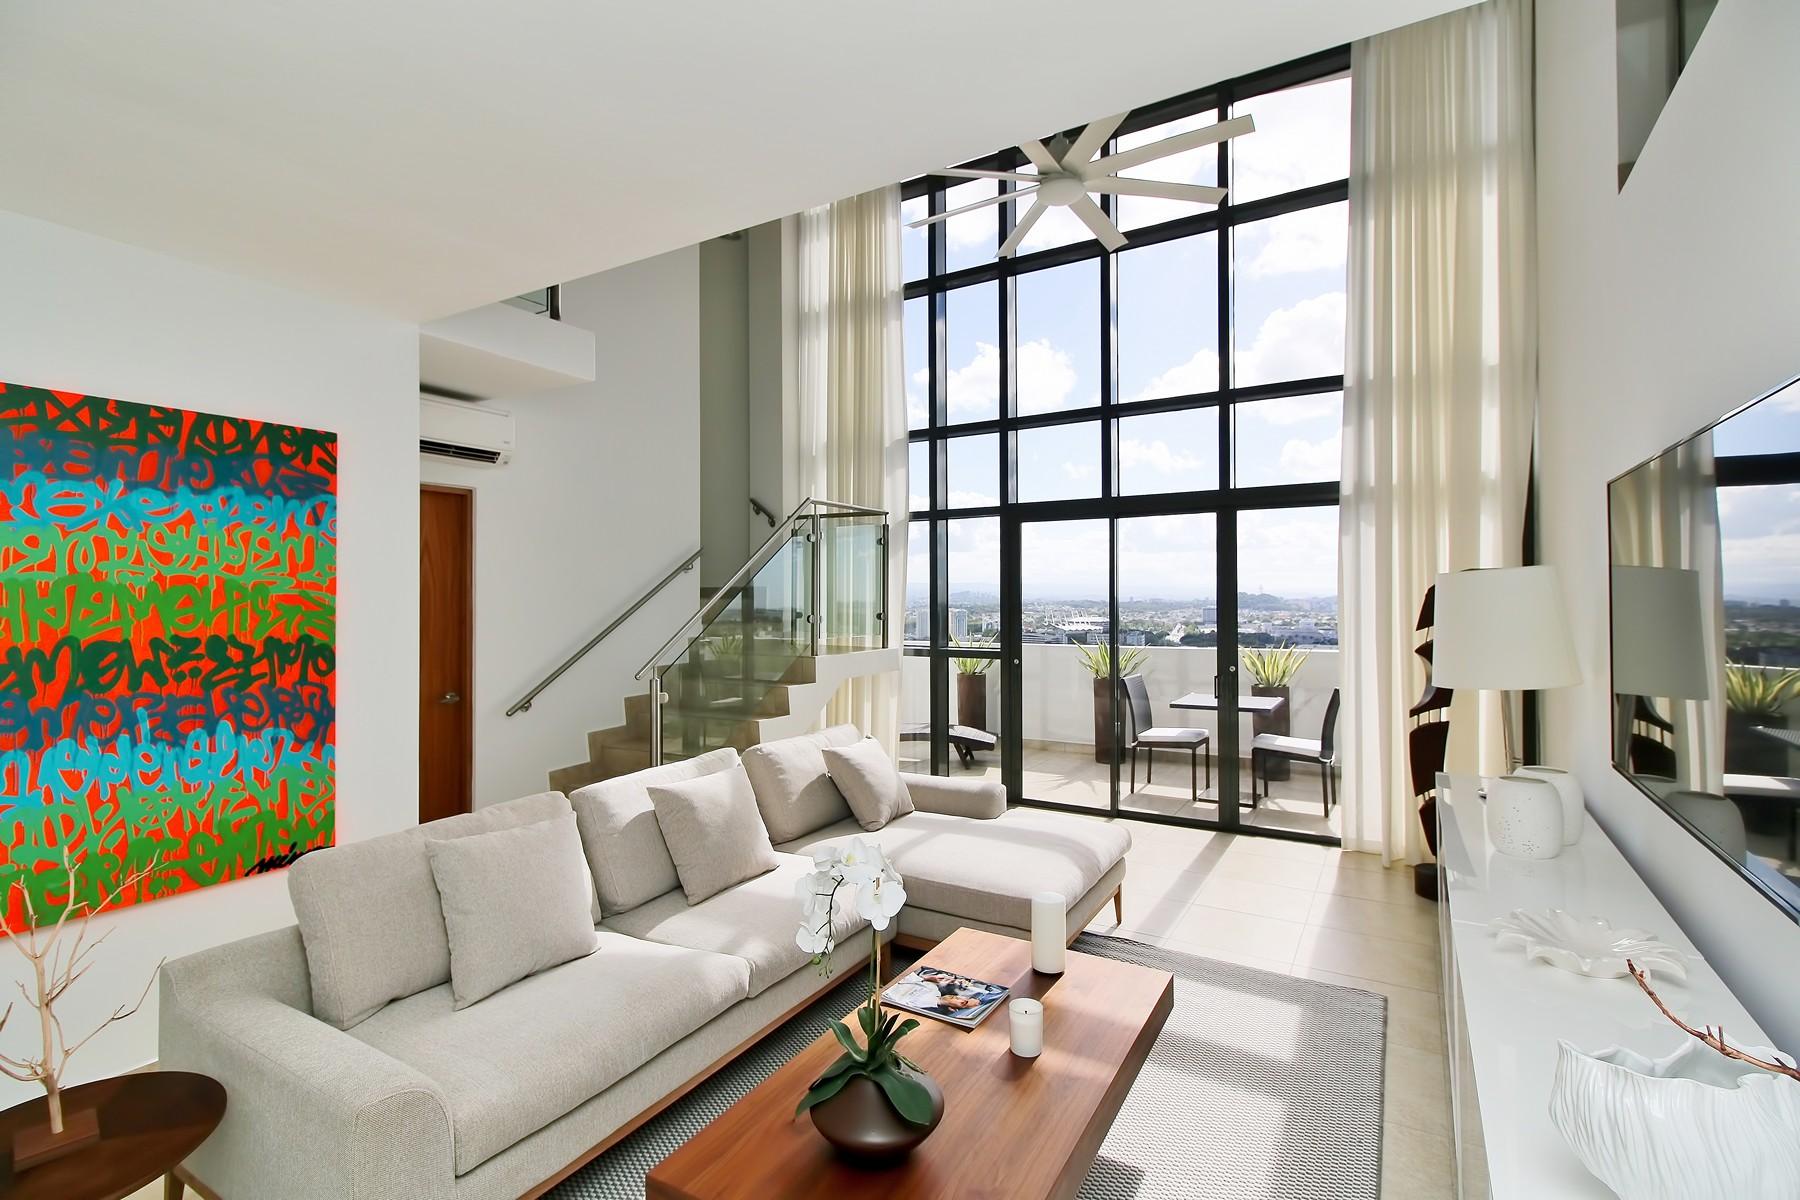 Condomínio para Venda às Penthouse at The Quantum, Financial District 120 Calle Carlos F Chardón Apt 2602 San Juan, Puerto Rico 00918 Puerto Rico